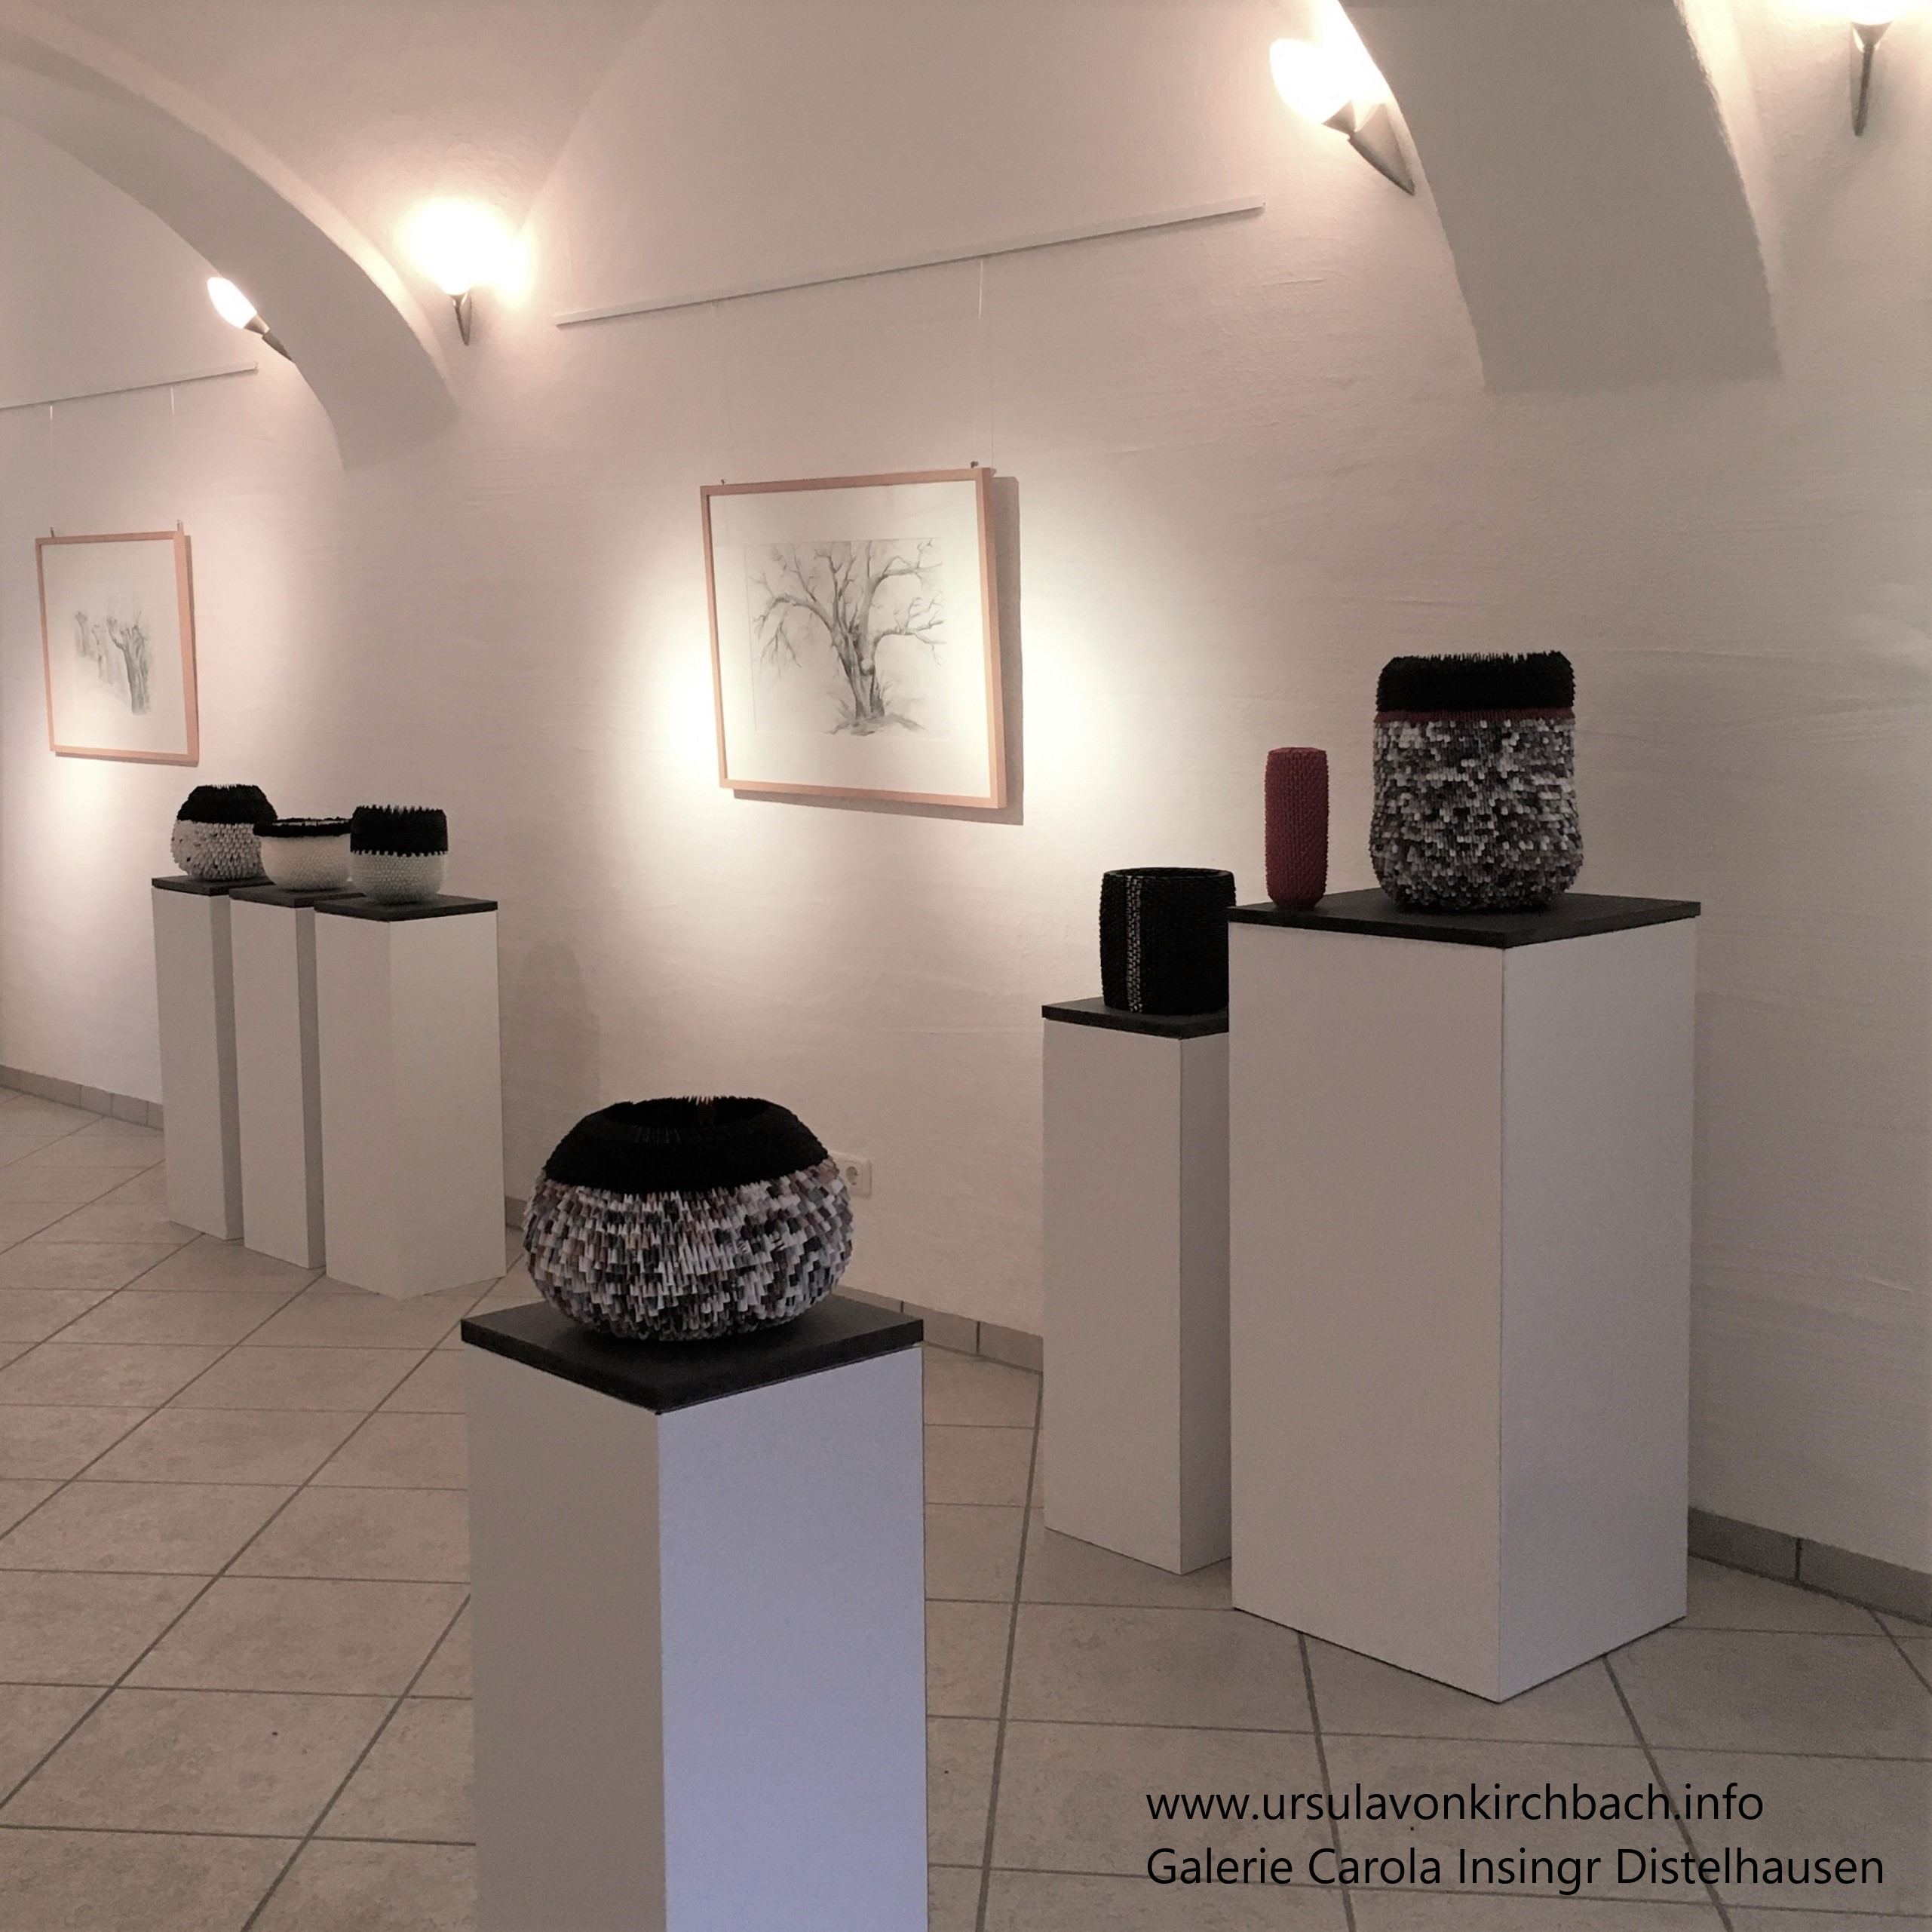 Galerie Carola Insinger Distelhausen 2